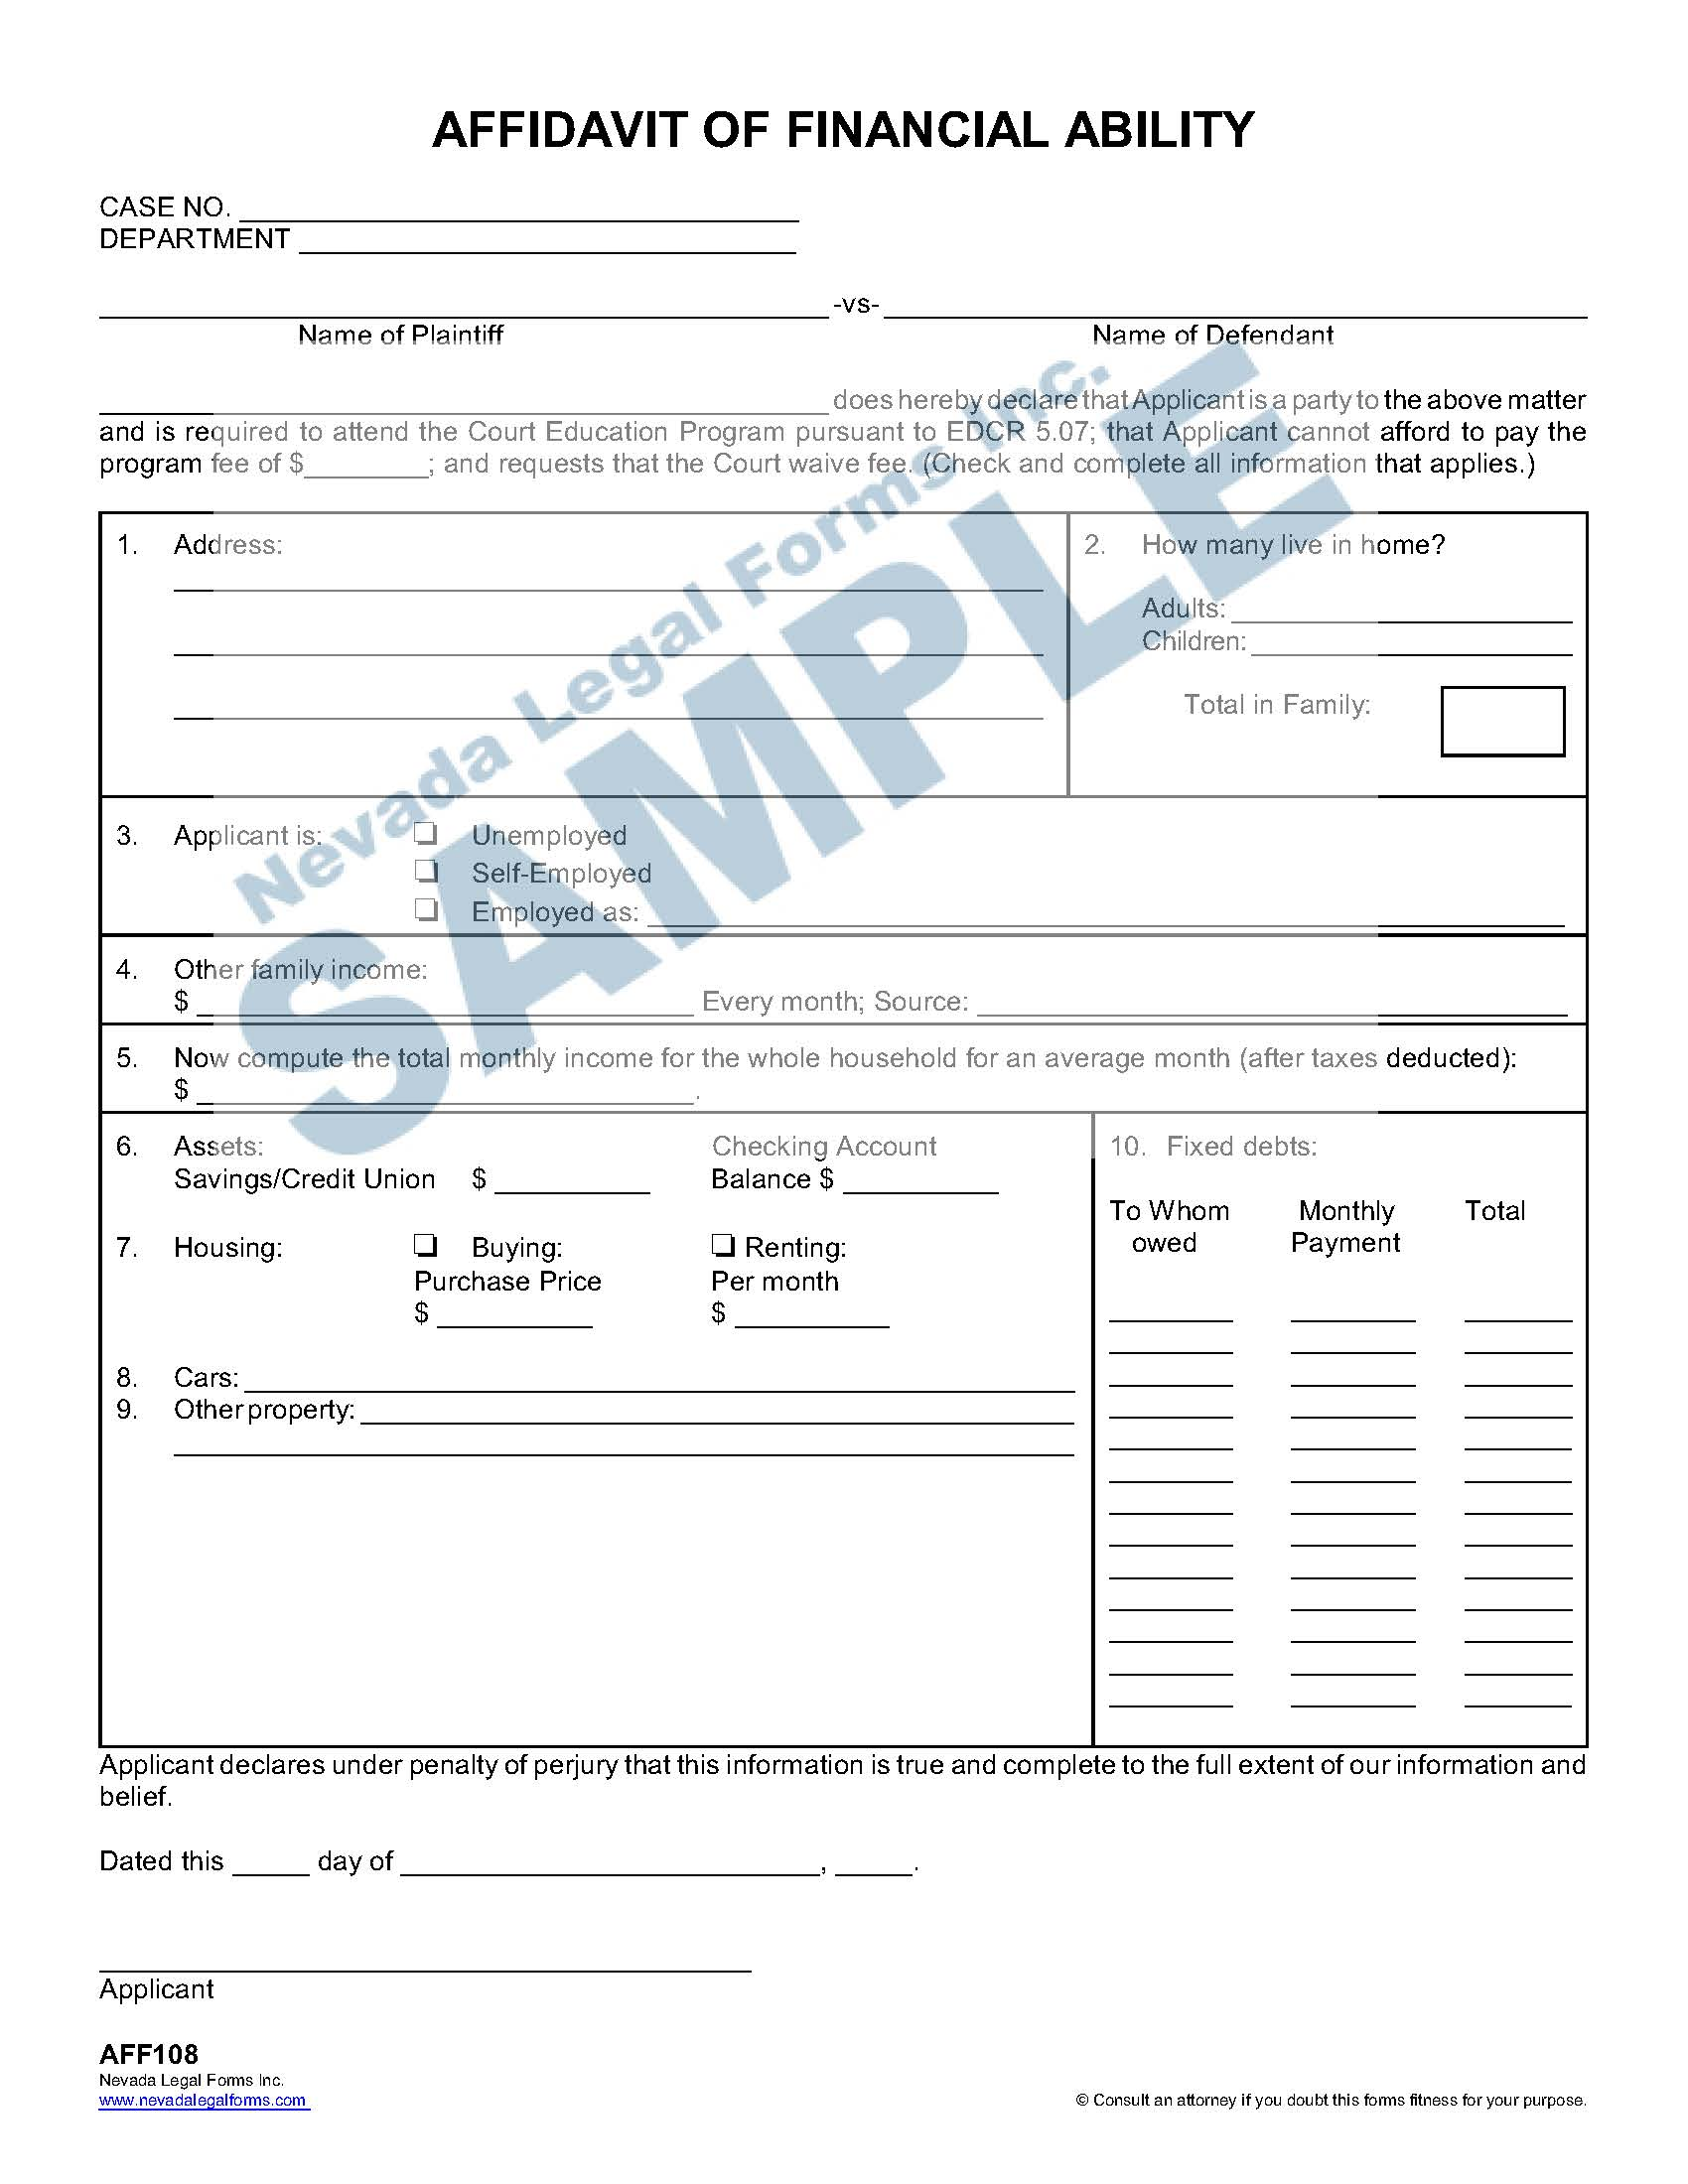 Affidavit Of Financial Ability